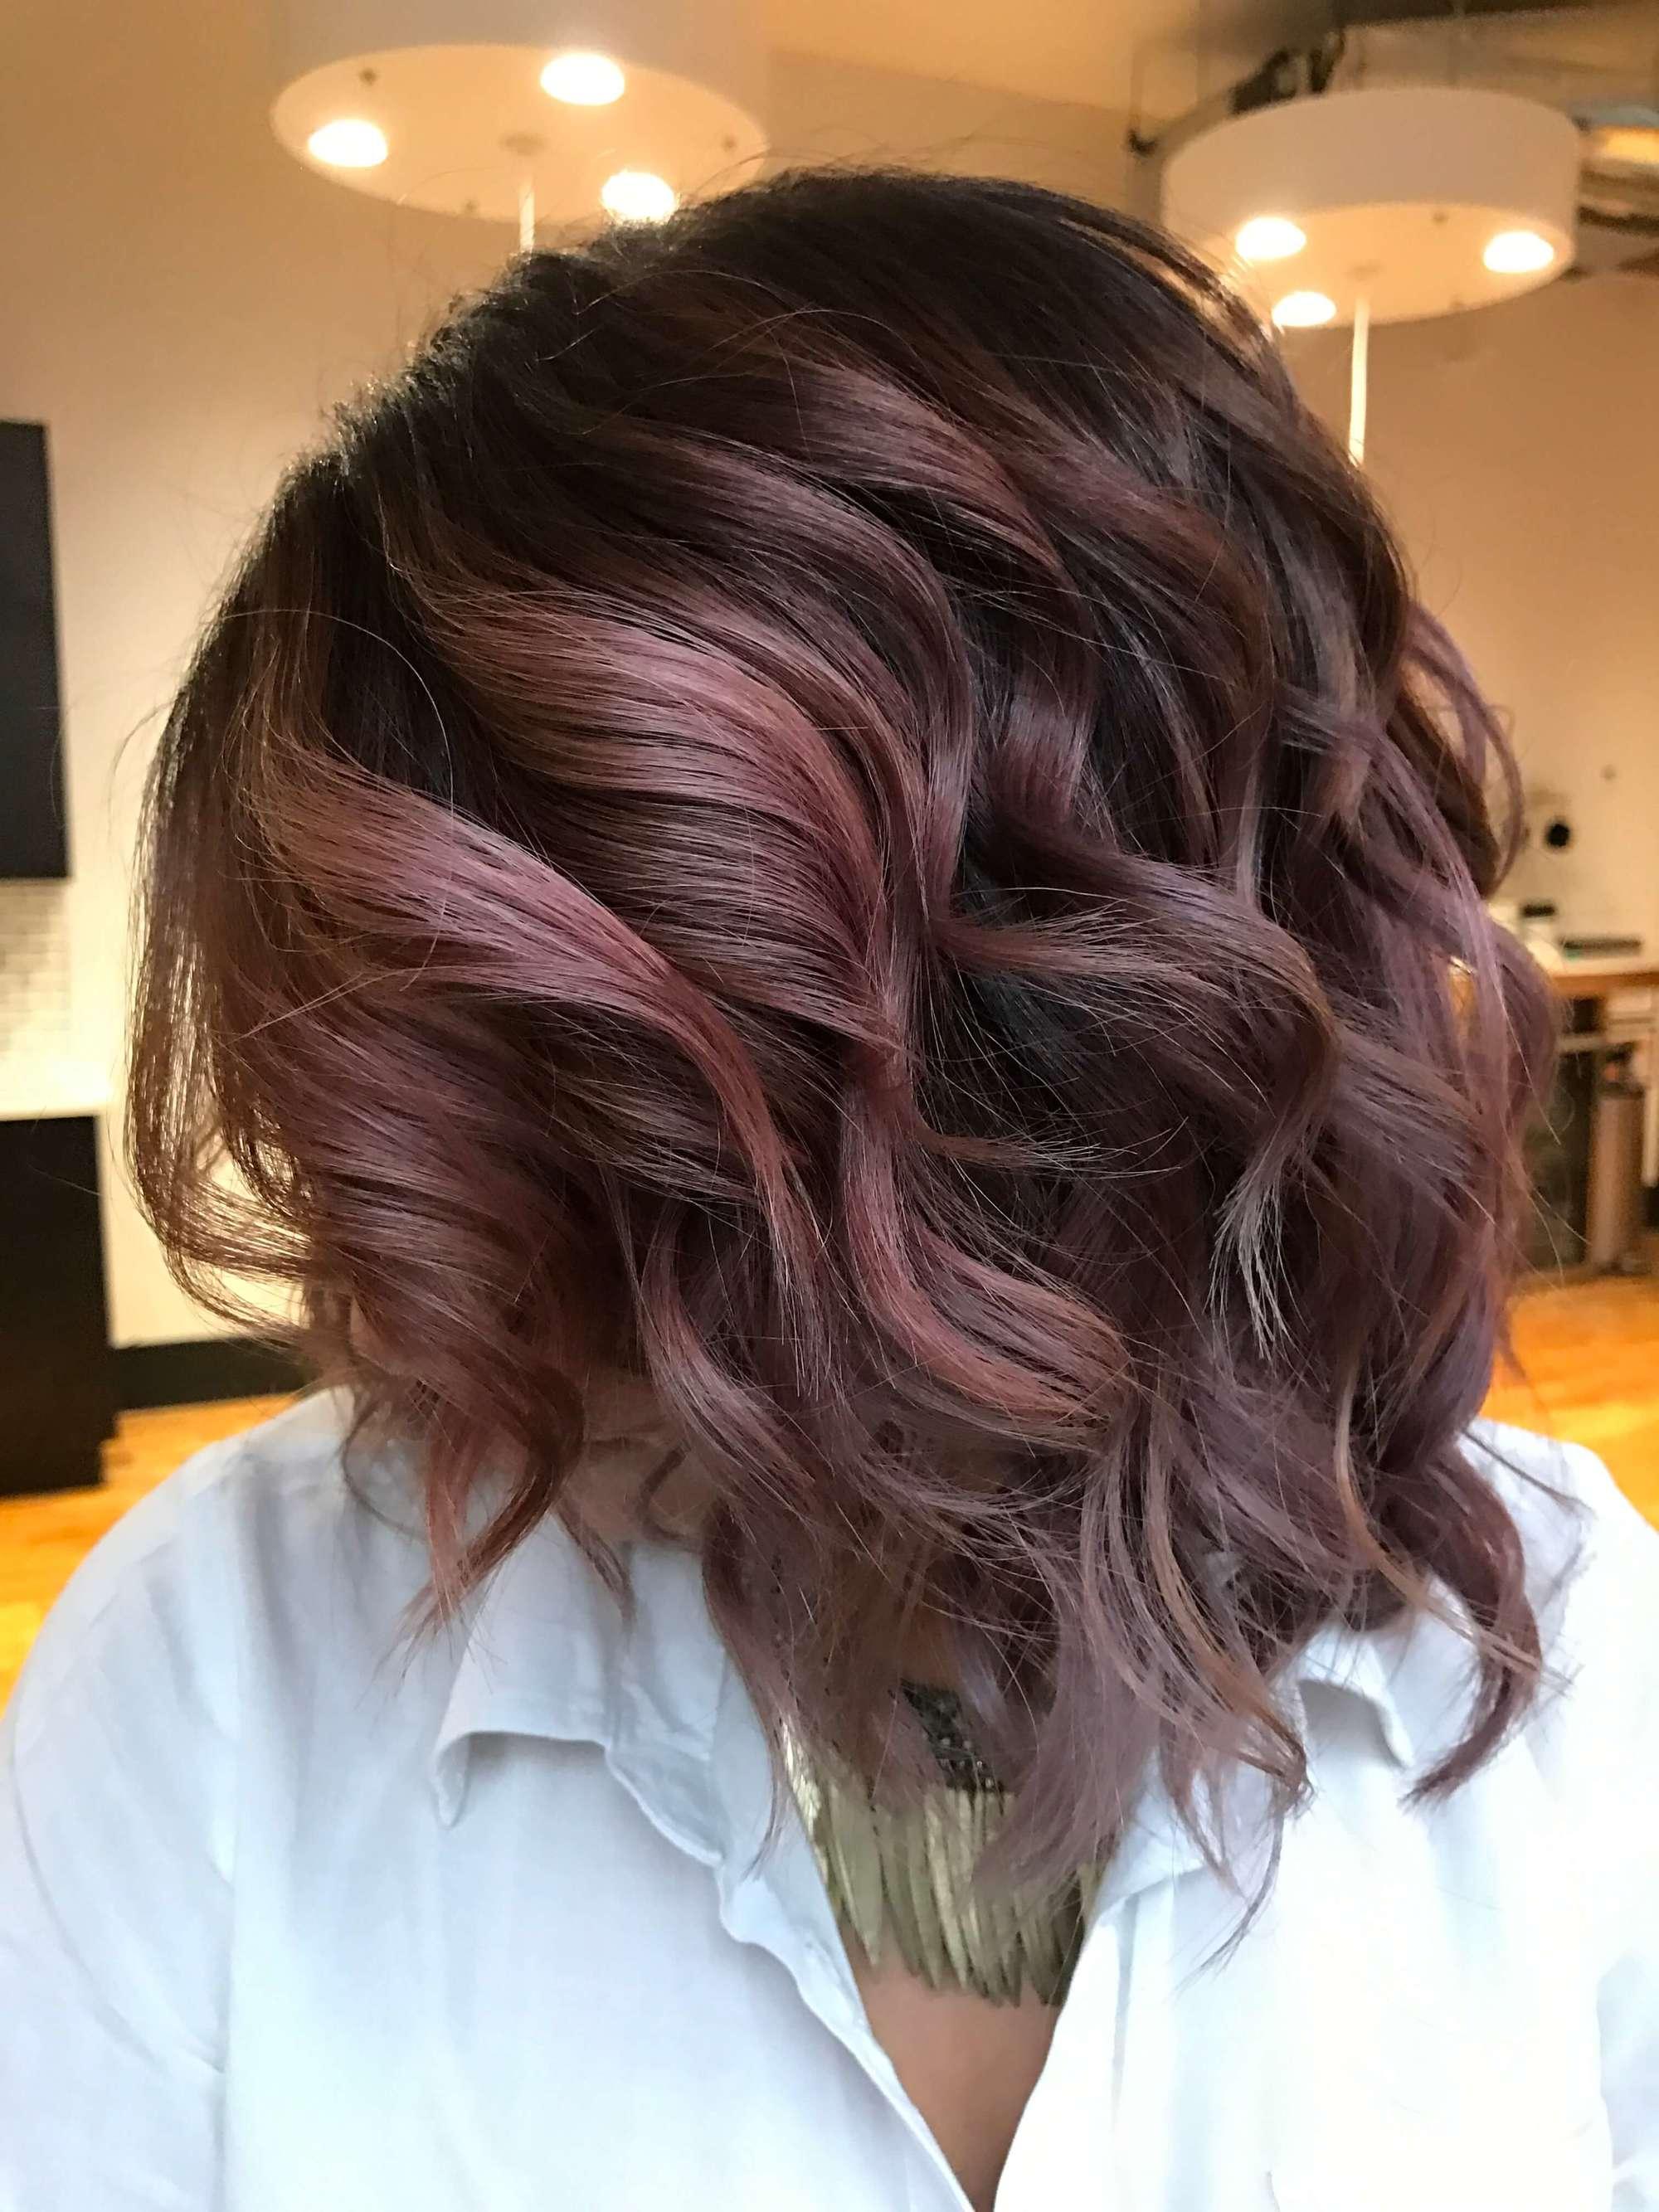 Woman with mauve hair streaks in brown hair.